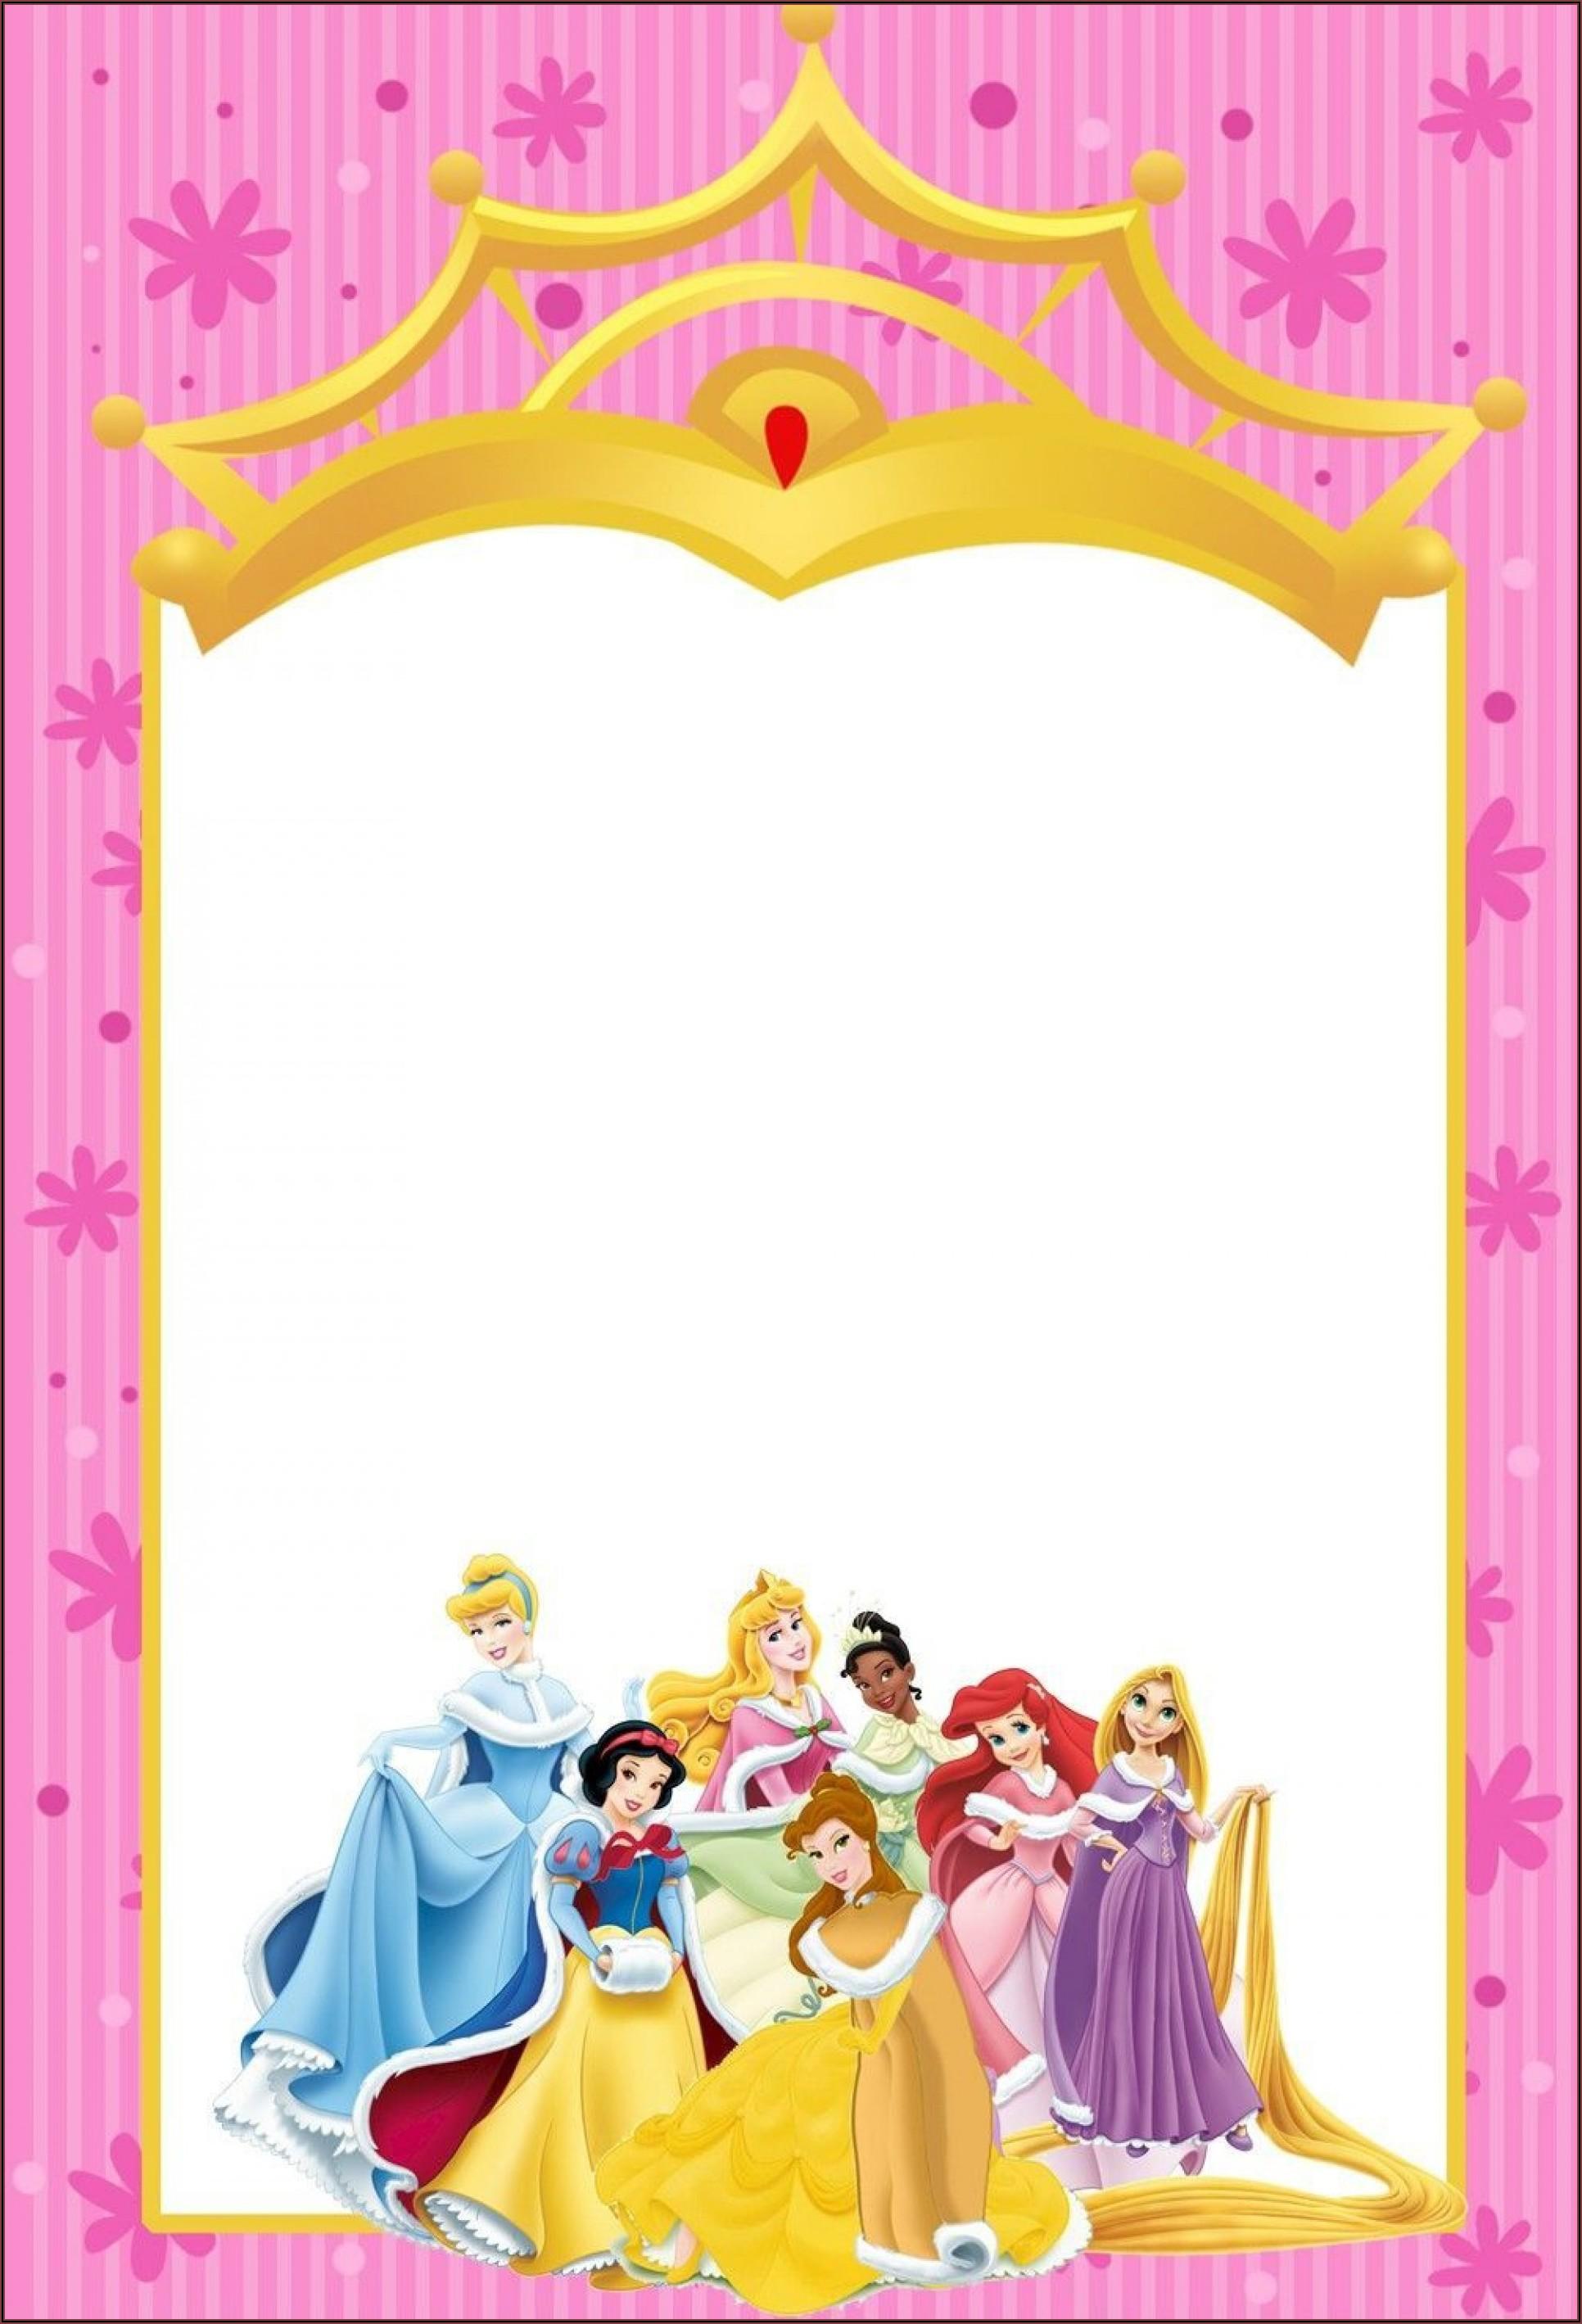 Editable Disney Princess Invitation Template